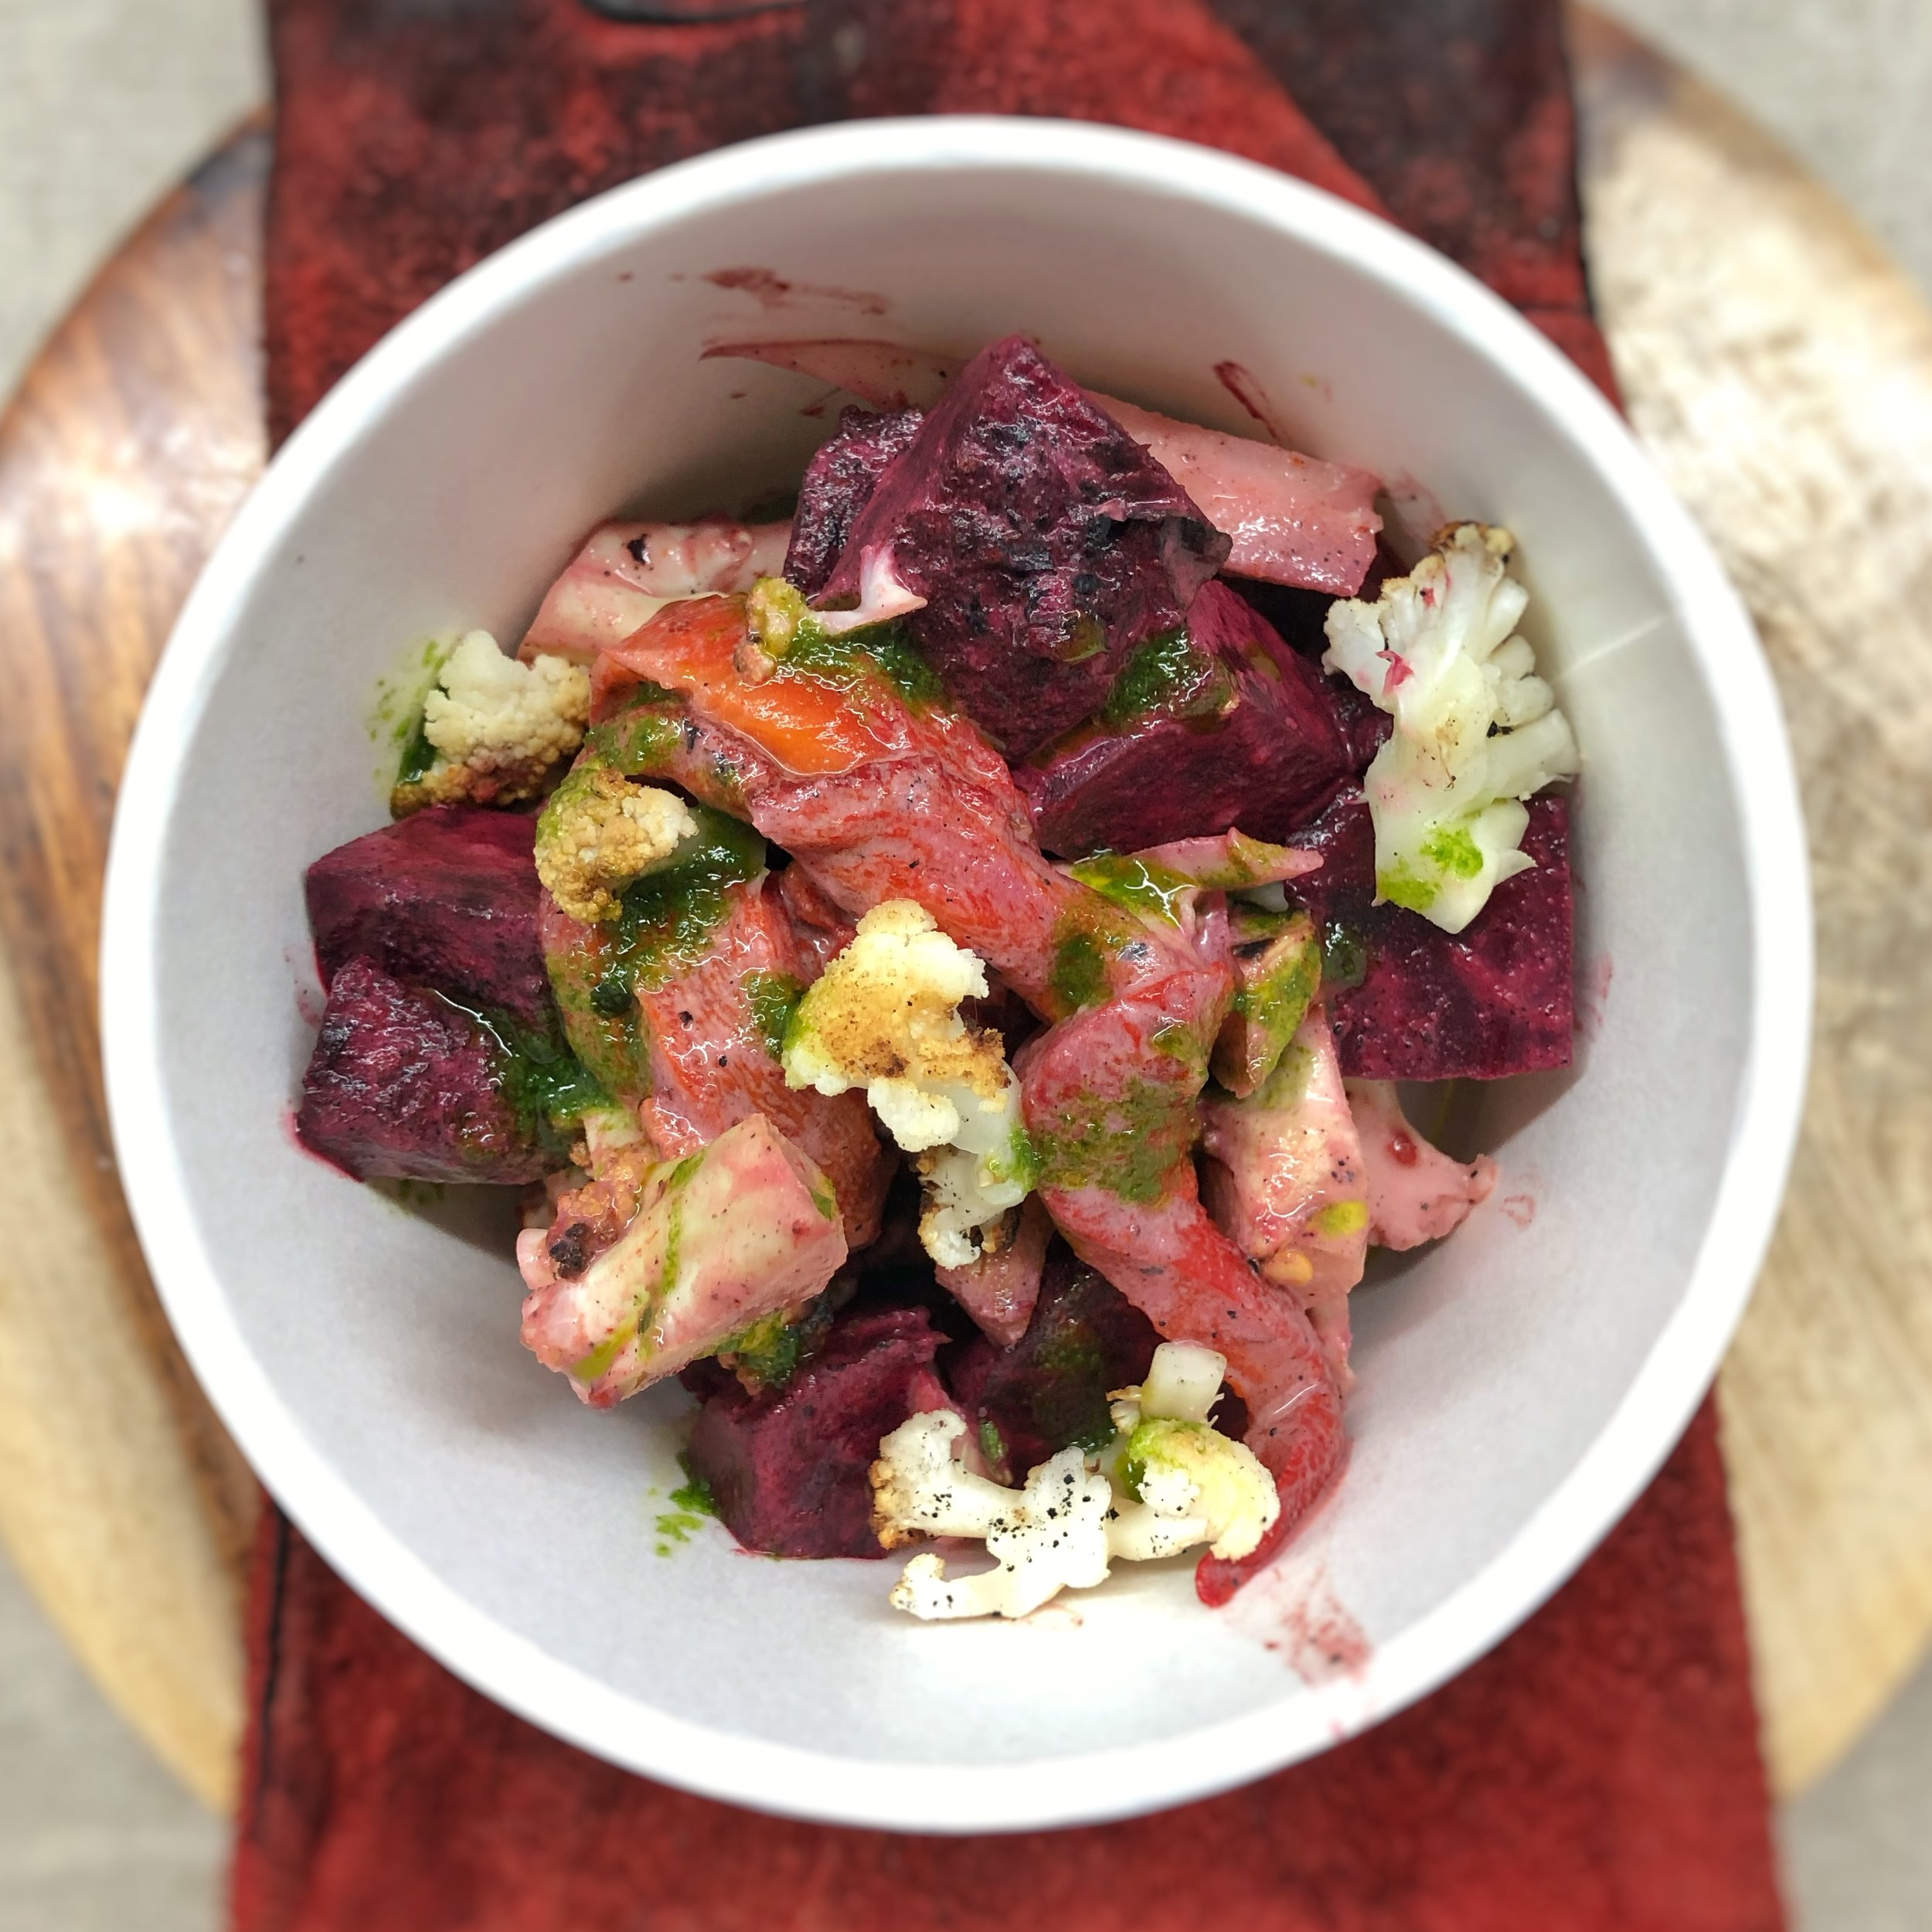 A dirty roast salad